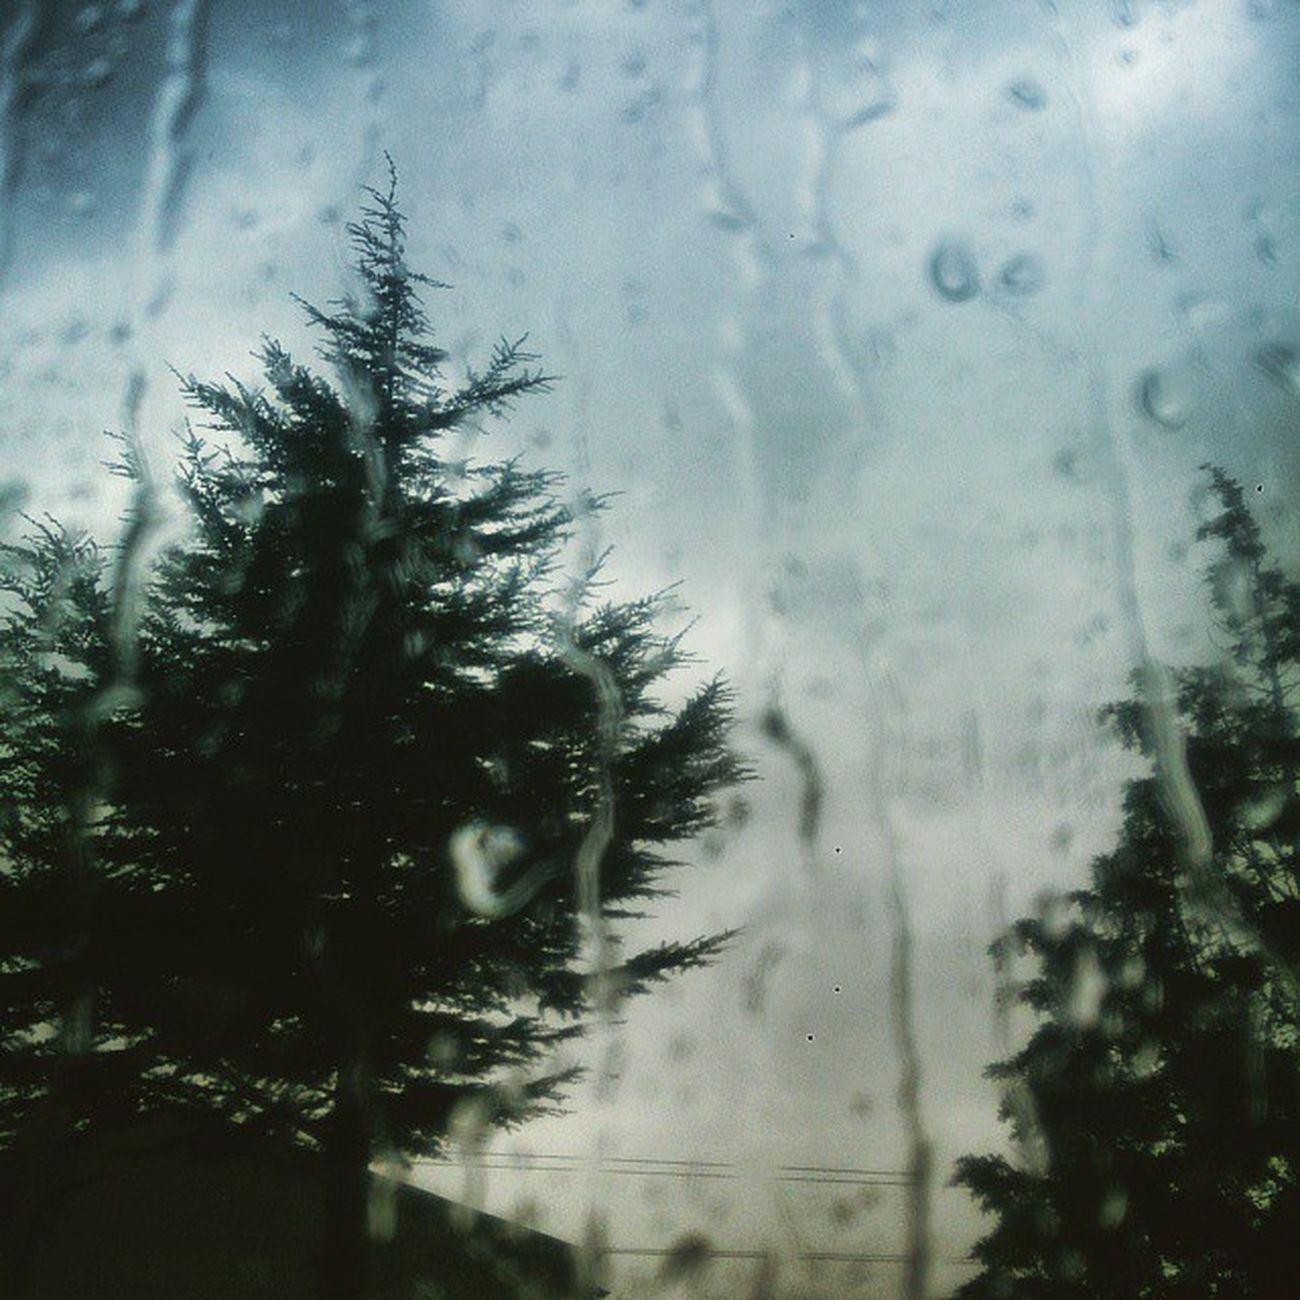 Havada son durum :) 🍀Ig_photo_life 🎶Fotografdukkanim 🔹Turkishfollowers Ⓜ️Fotografheryere 🍂Ig_global_life🍀 Anlatistanbul 🍂Gulumseaska💟 Igbest_shotz 🙏Fotohayat🉑 Grafimx 🍂My_dream_turkey 🏯Photo_turkey🍂 Türkiyefk 🍀Sizinkareleriniz🍂 Fotozamani 🍂Gününkaresi🍁 Photo_storee 🎇Ig4world🍂 Objektifimden 🍂Gokkusagıphotography 🍂Turkinstagram🍀 Zamanidurdur 🍂Instagramturkey 🍂Allshotsturkey🍂 Igturko 🍀anipaylas 🍂nature_wizards🍂canlifotograf 🍂fotozamani🍂fotosentez